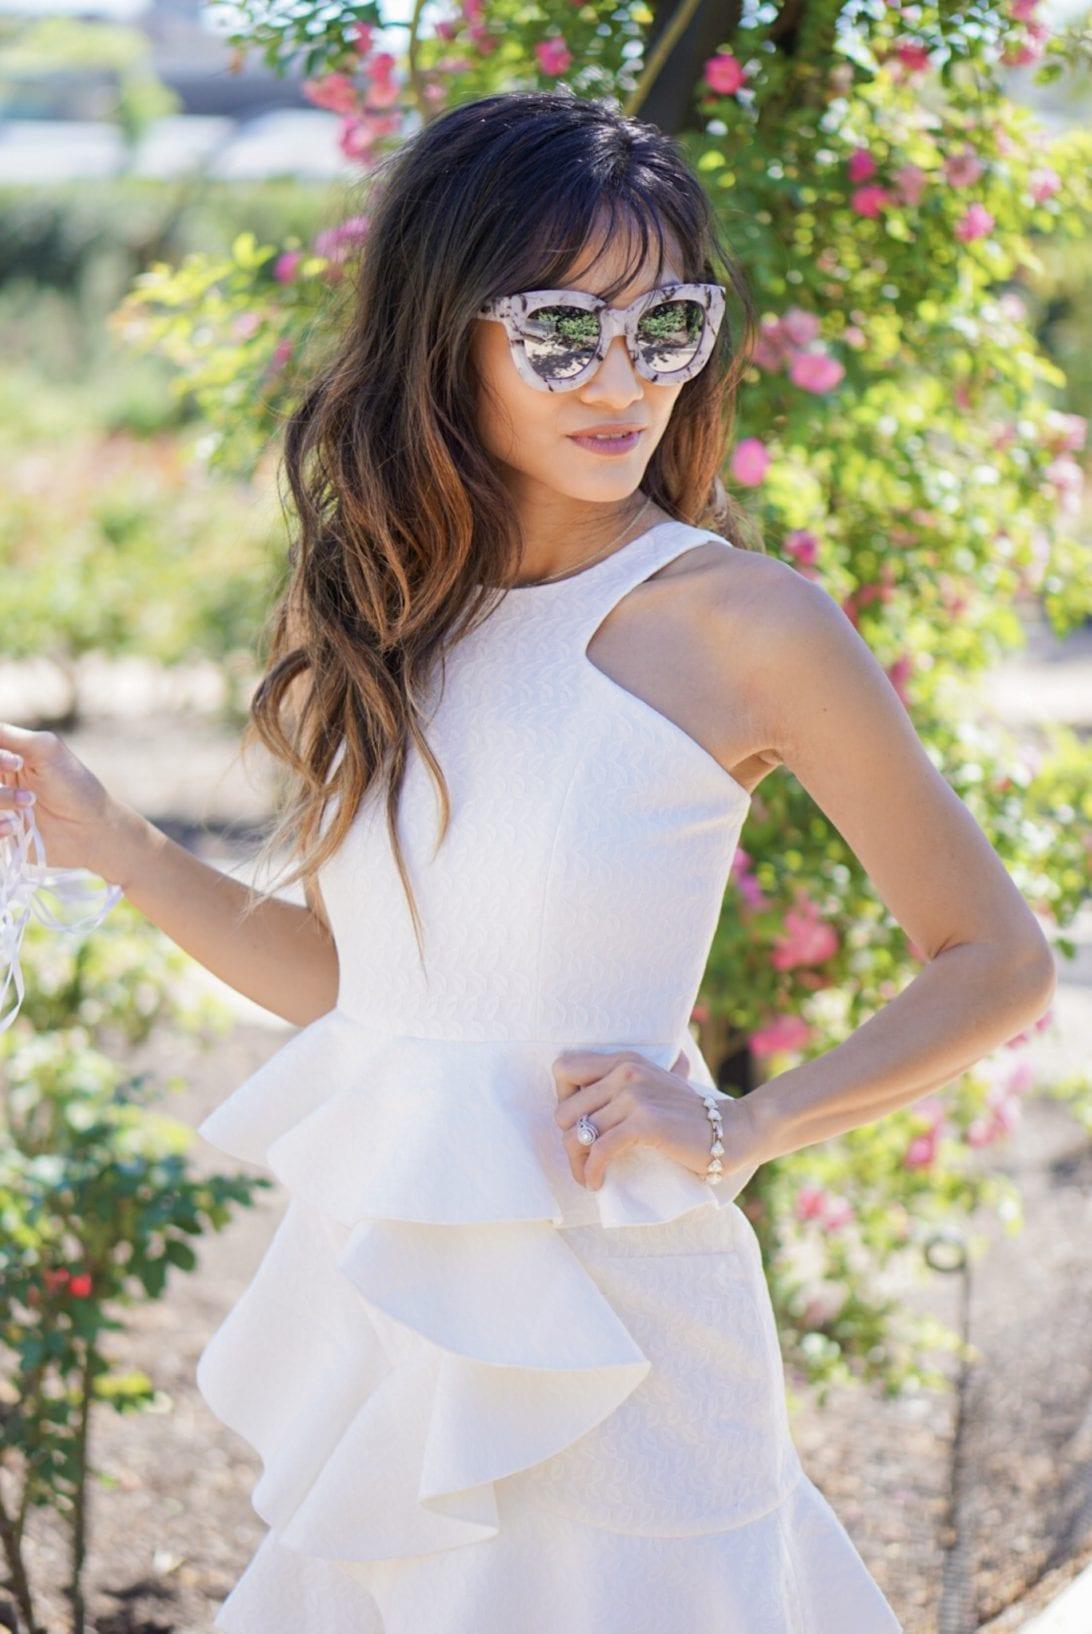 quay sunglasses, chic wish dress, ruffle dress